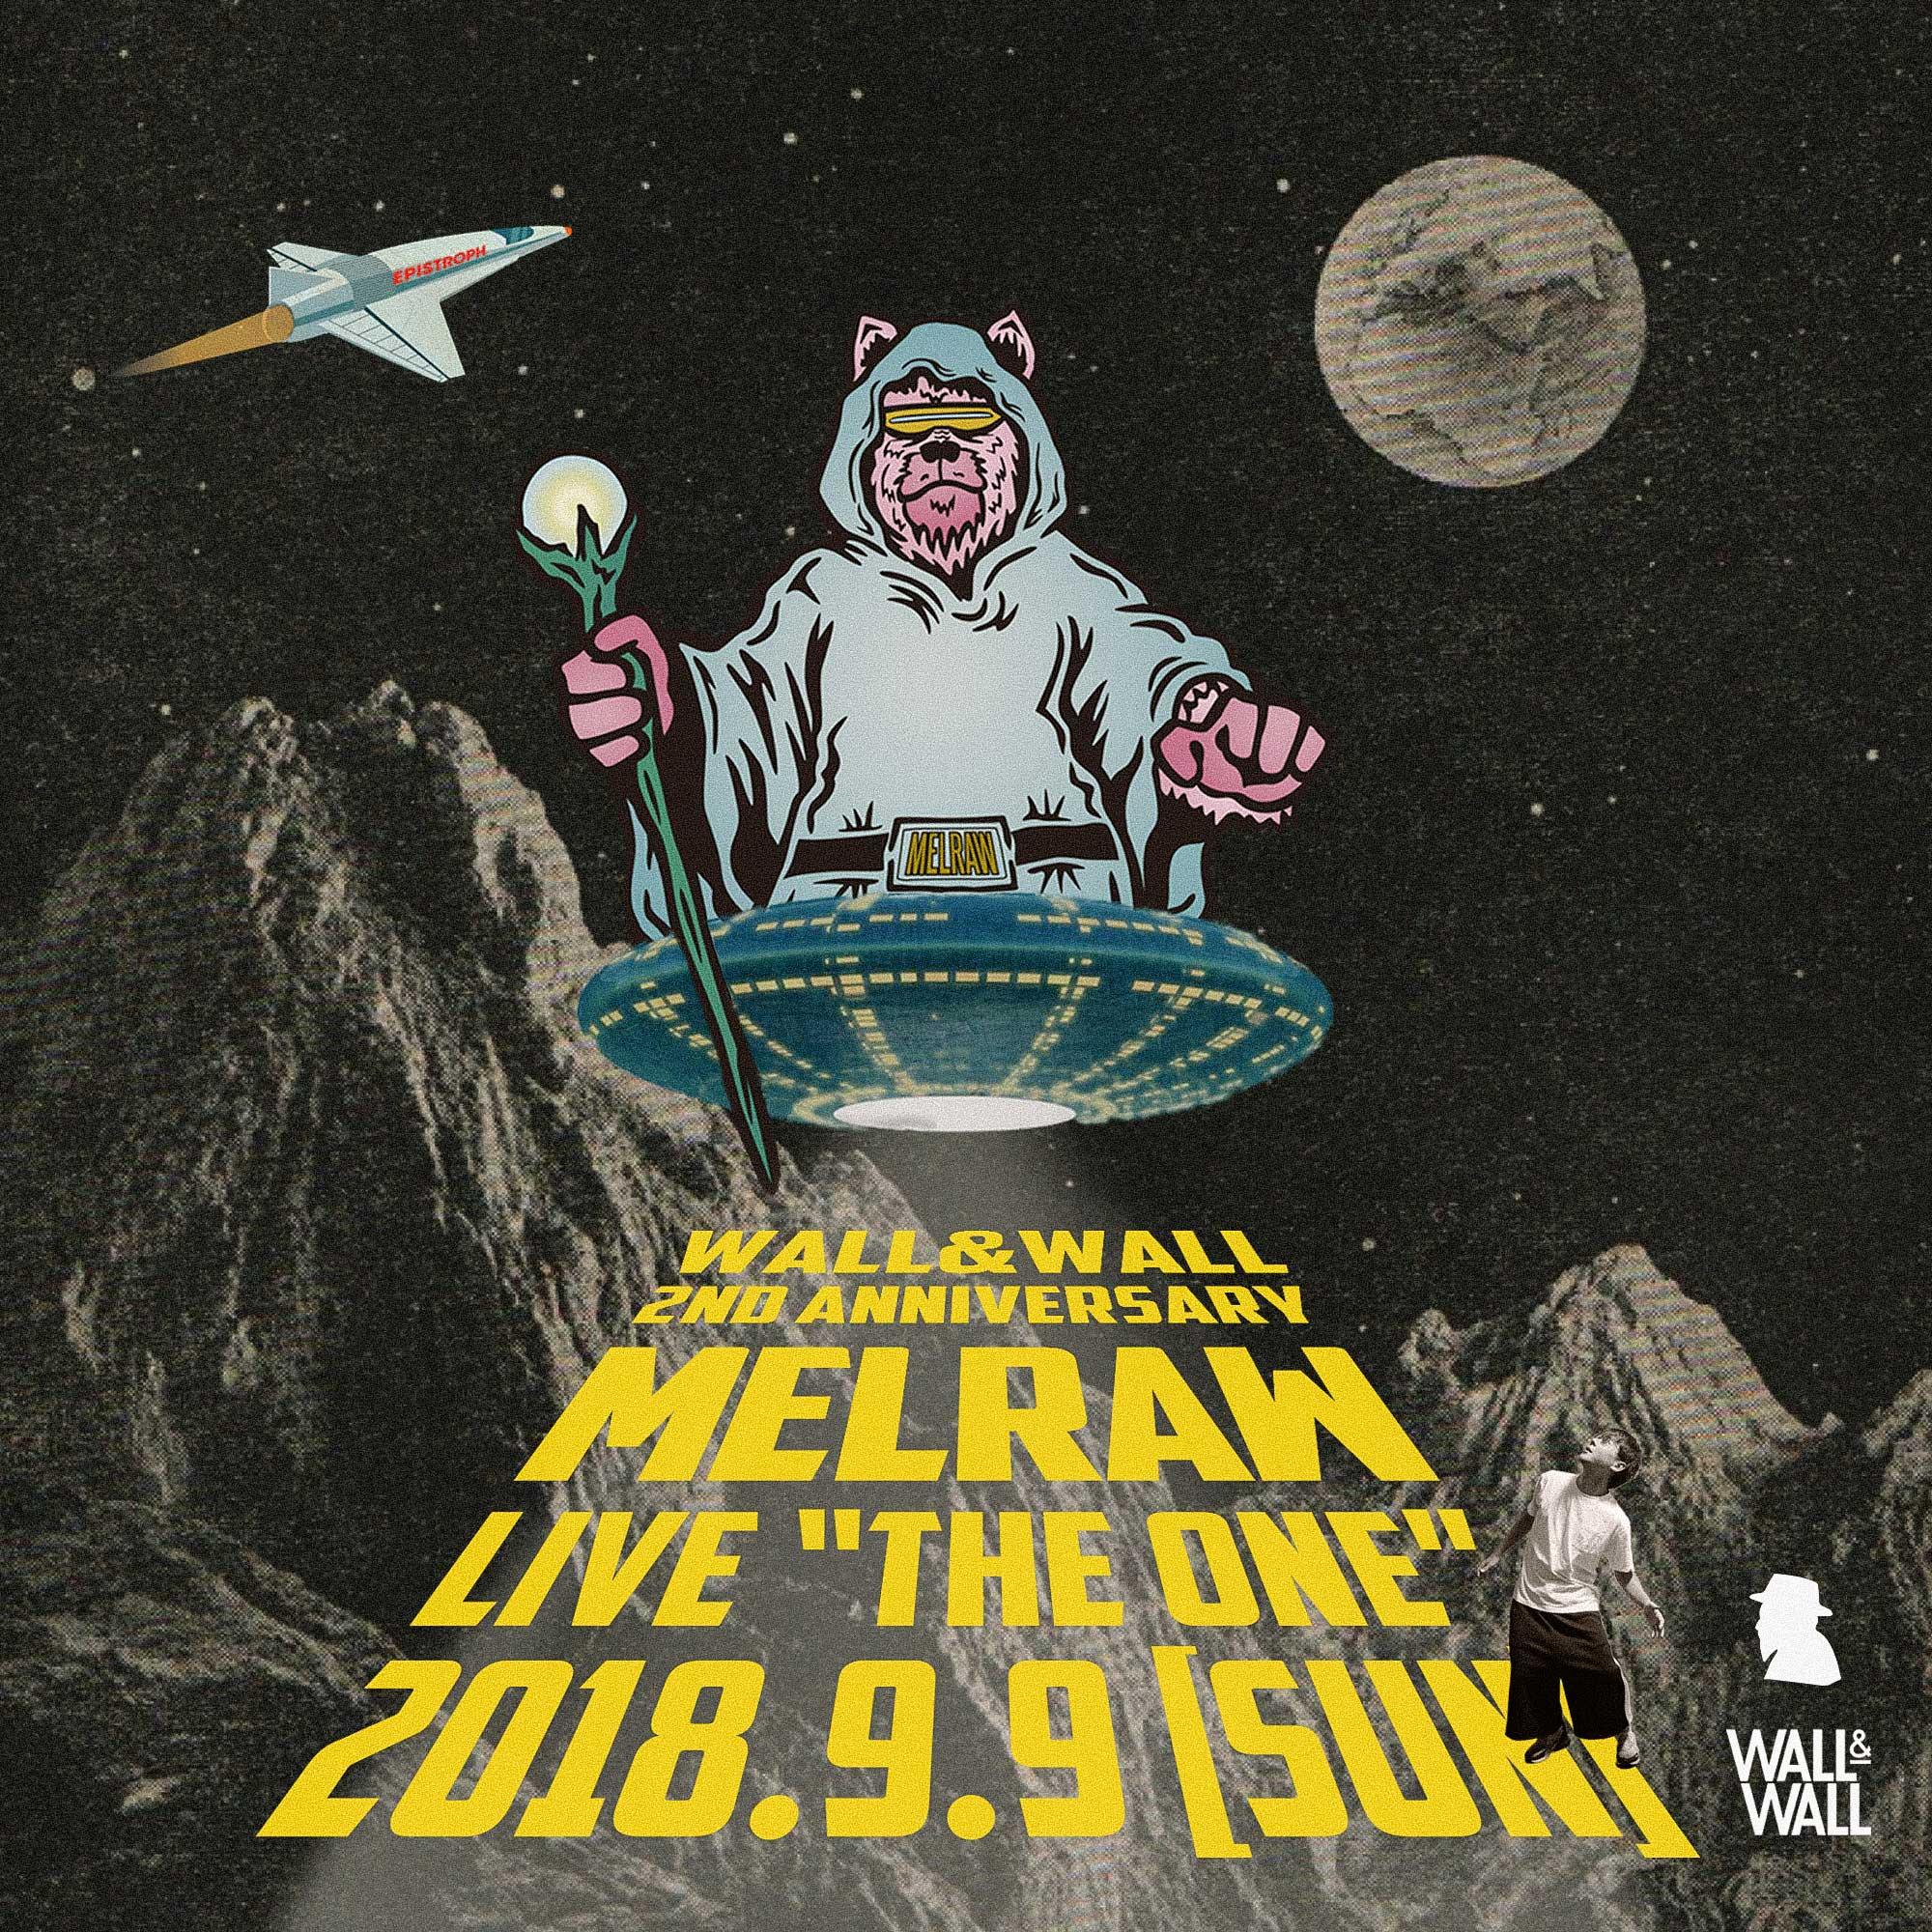 melraw_oneman_Flyer